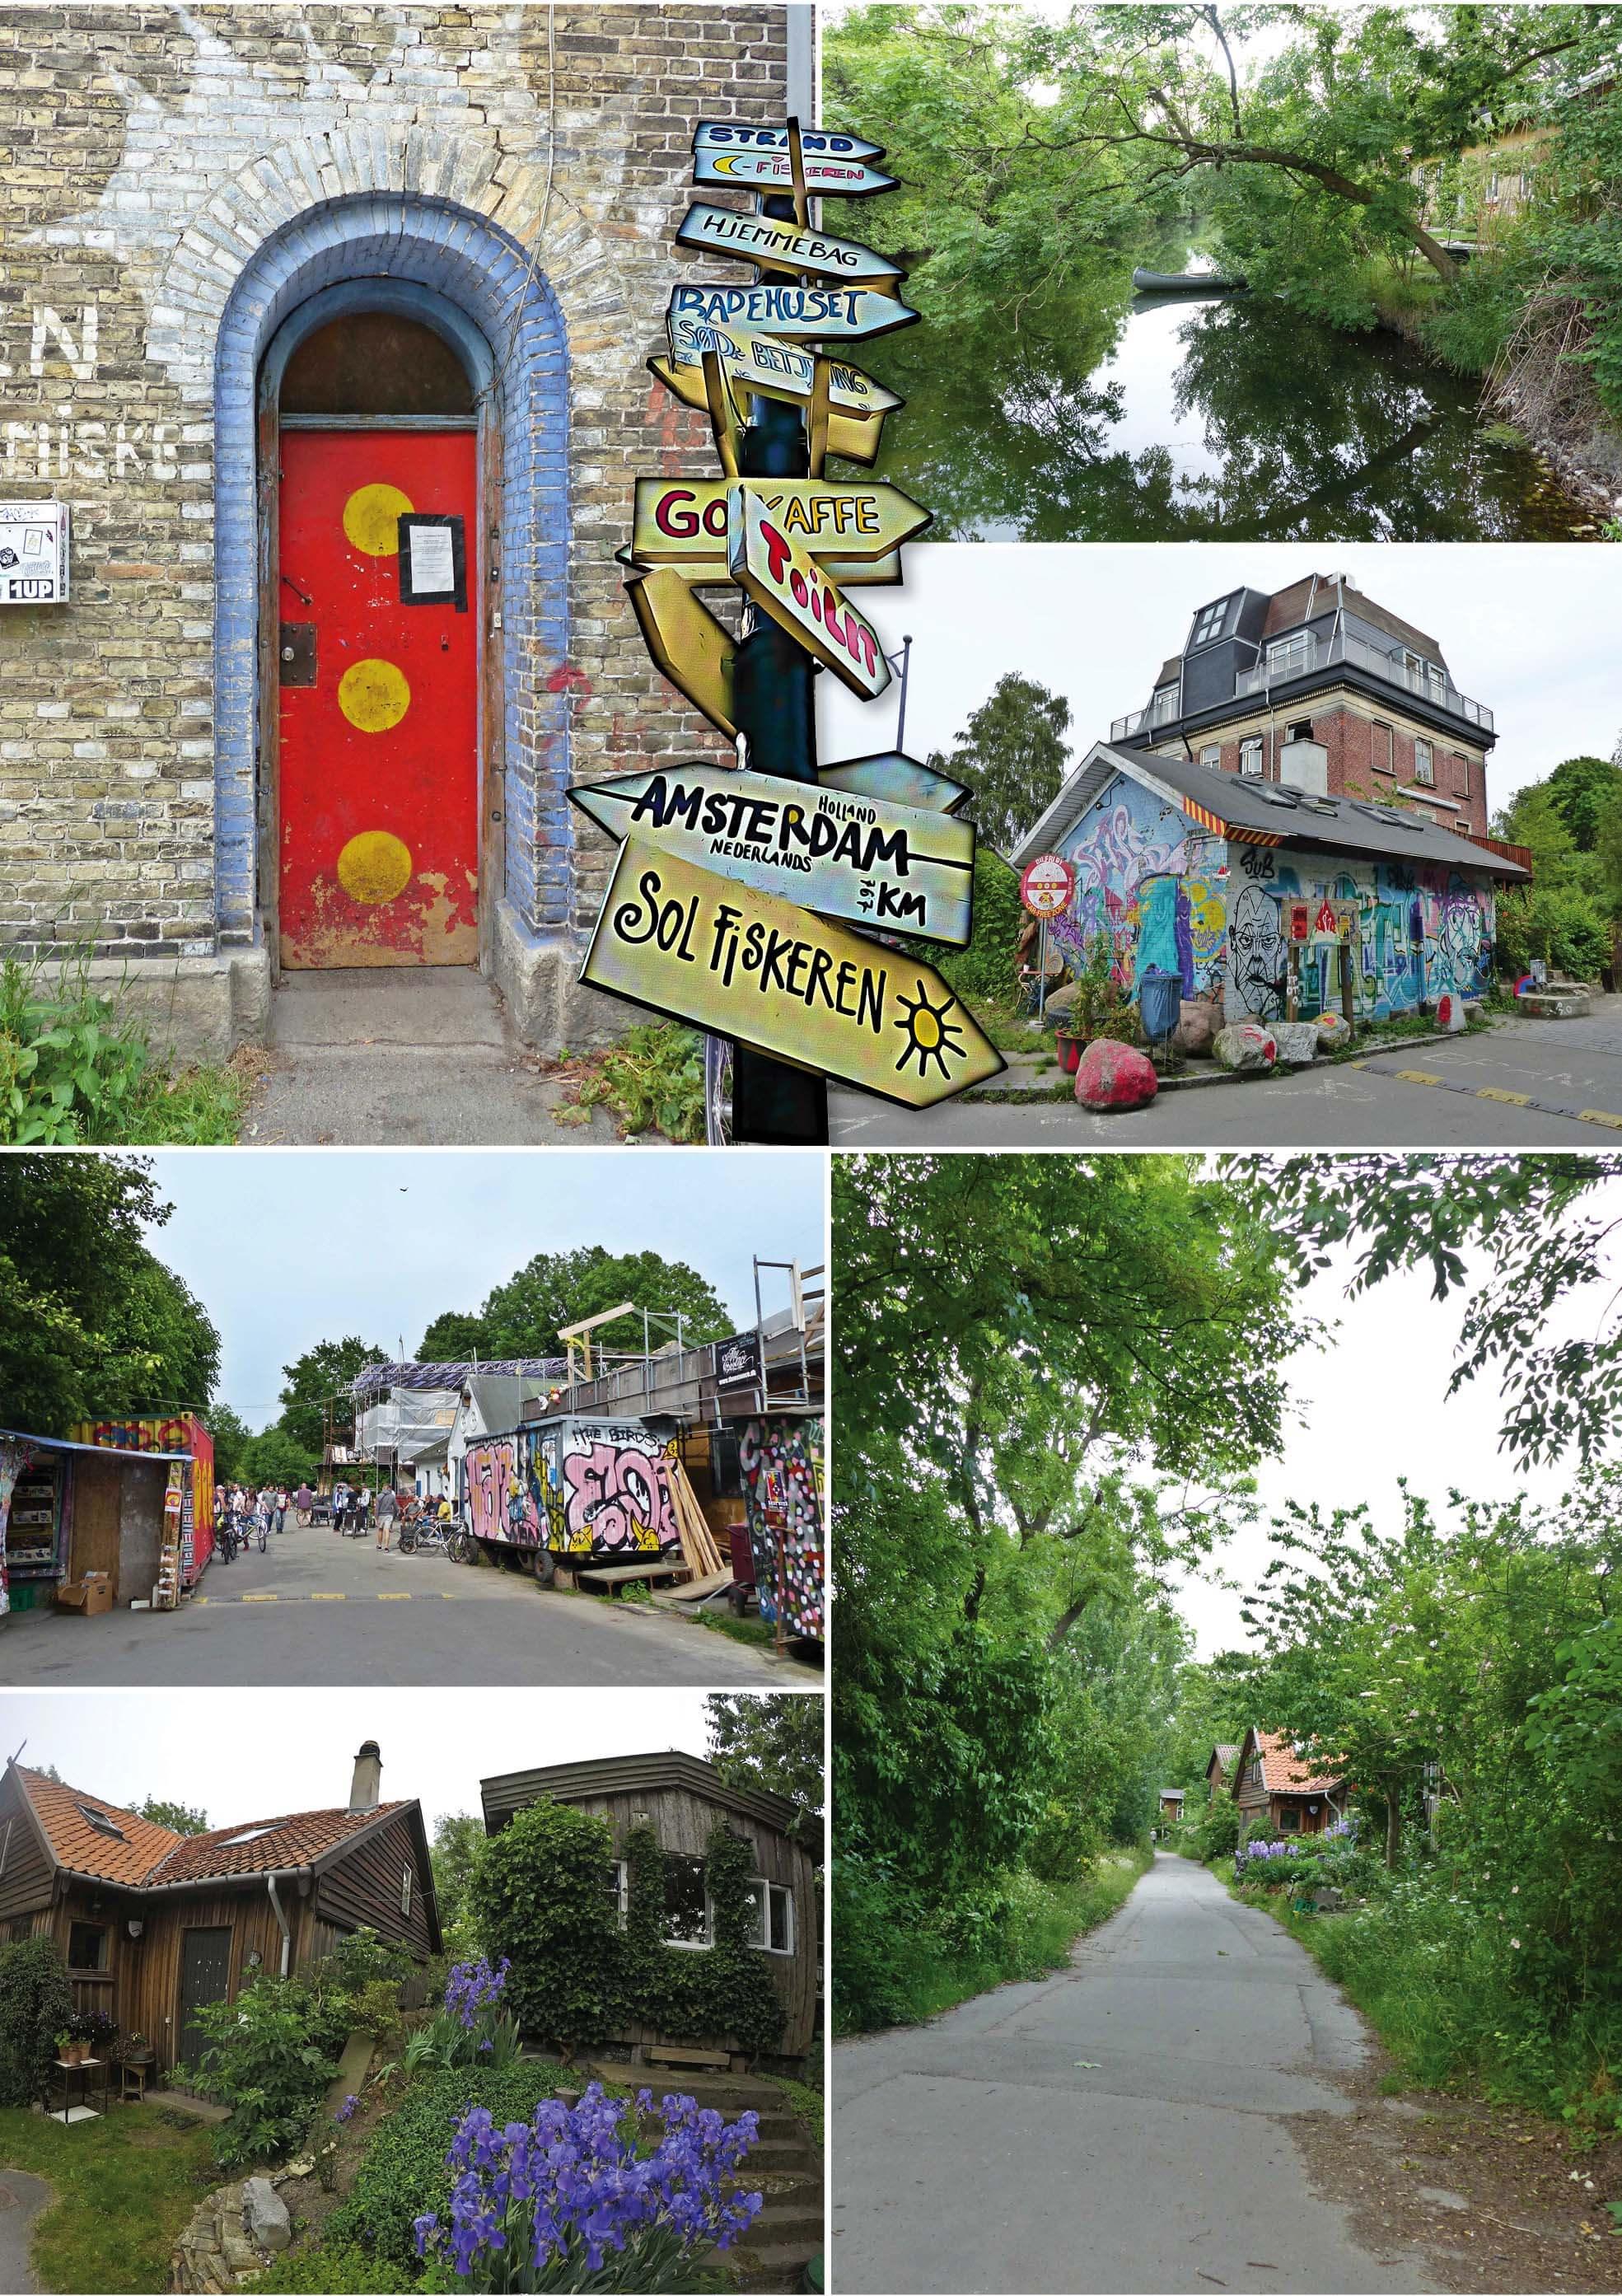 copenhague, danemark, Denmark, voyage, europe, christiania, velos, hippies, street art, art, tag, maison